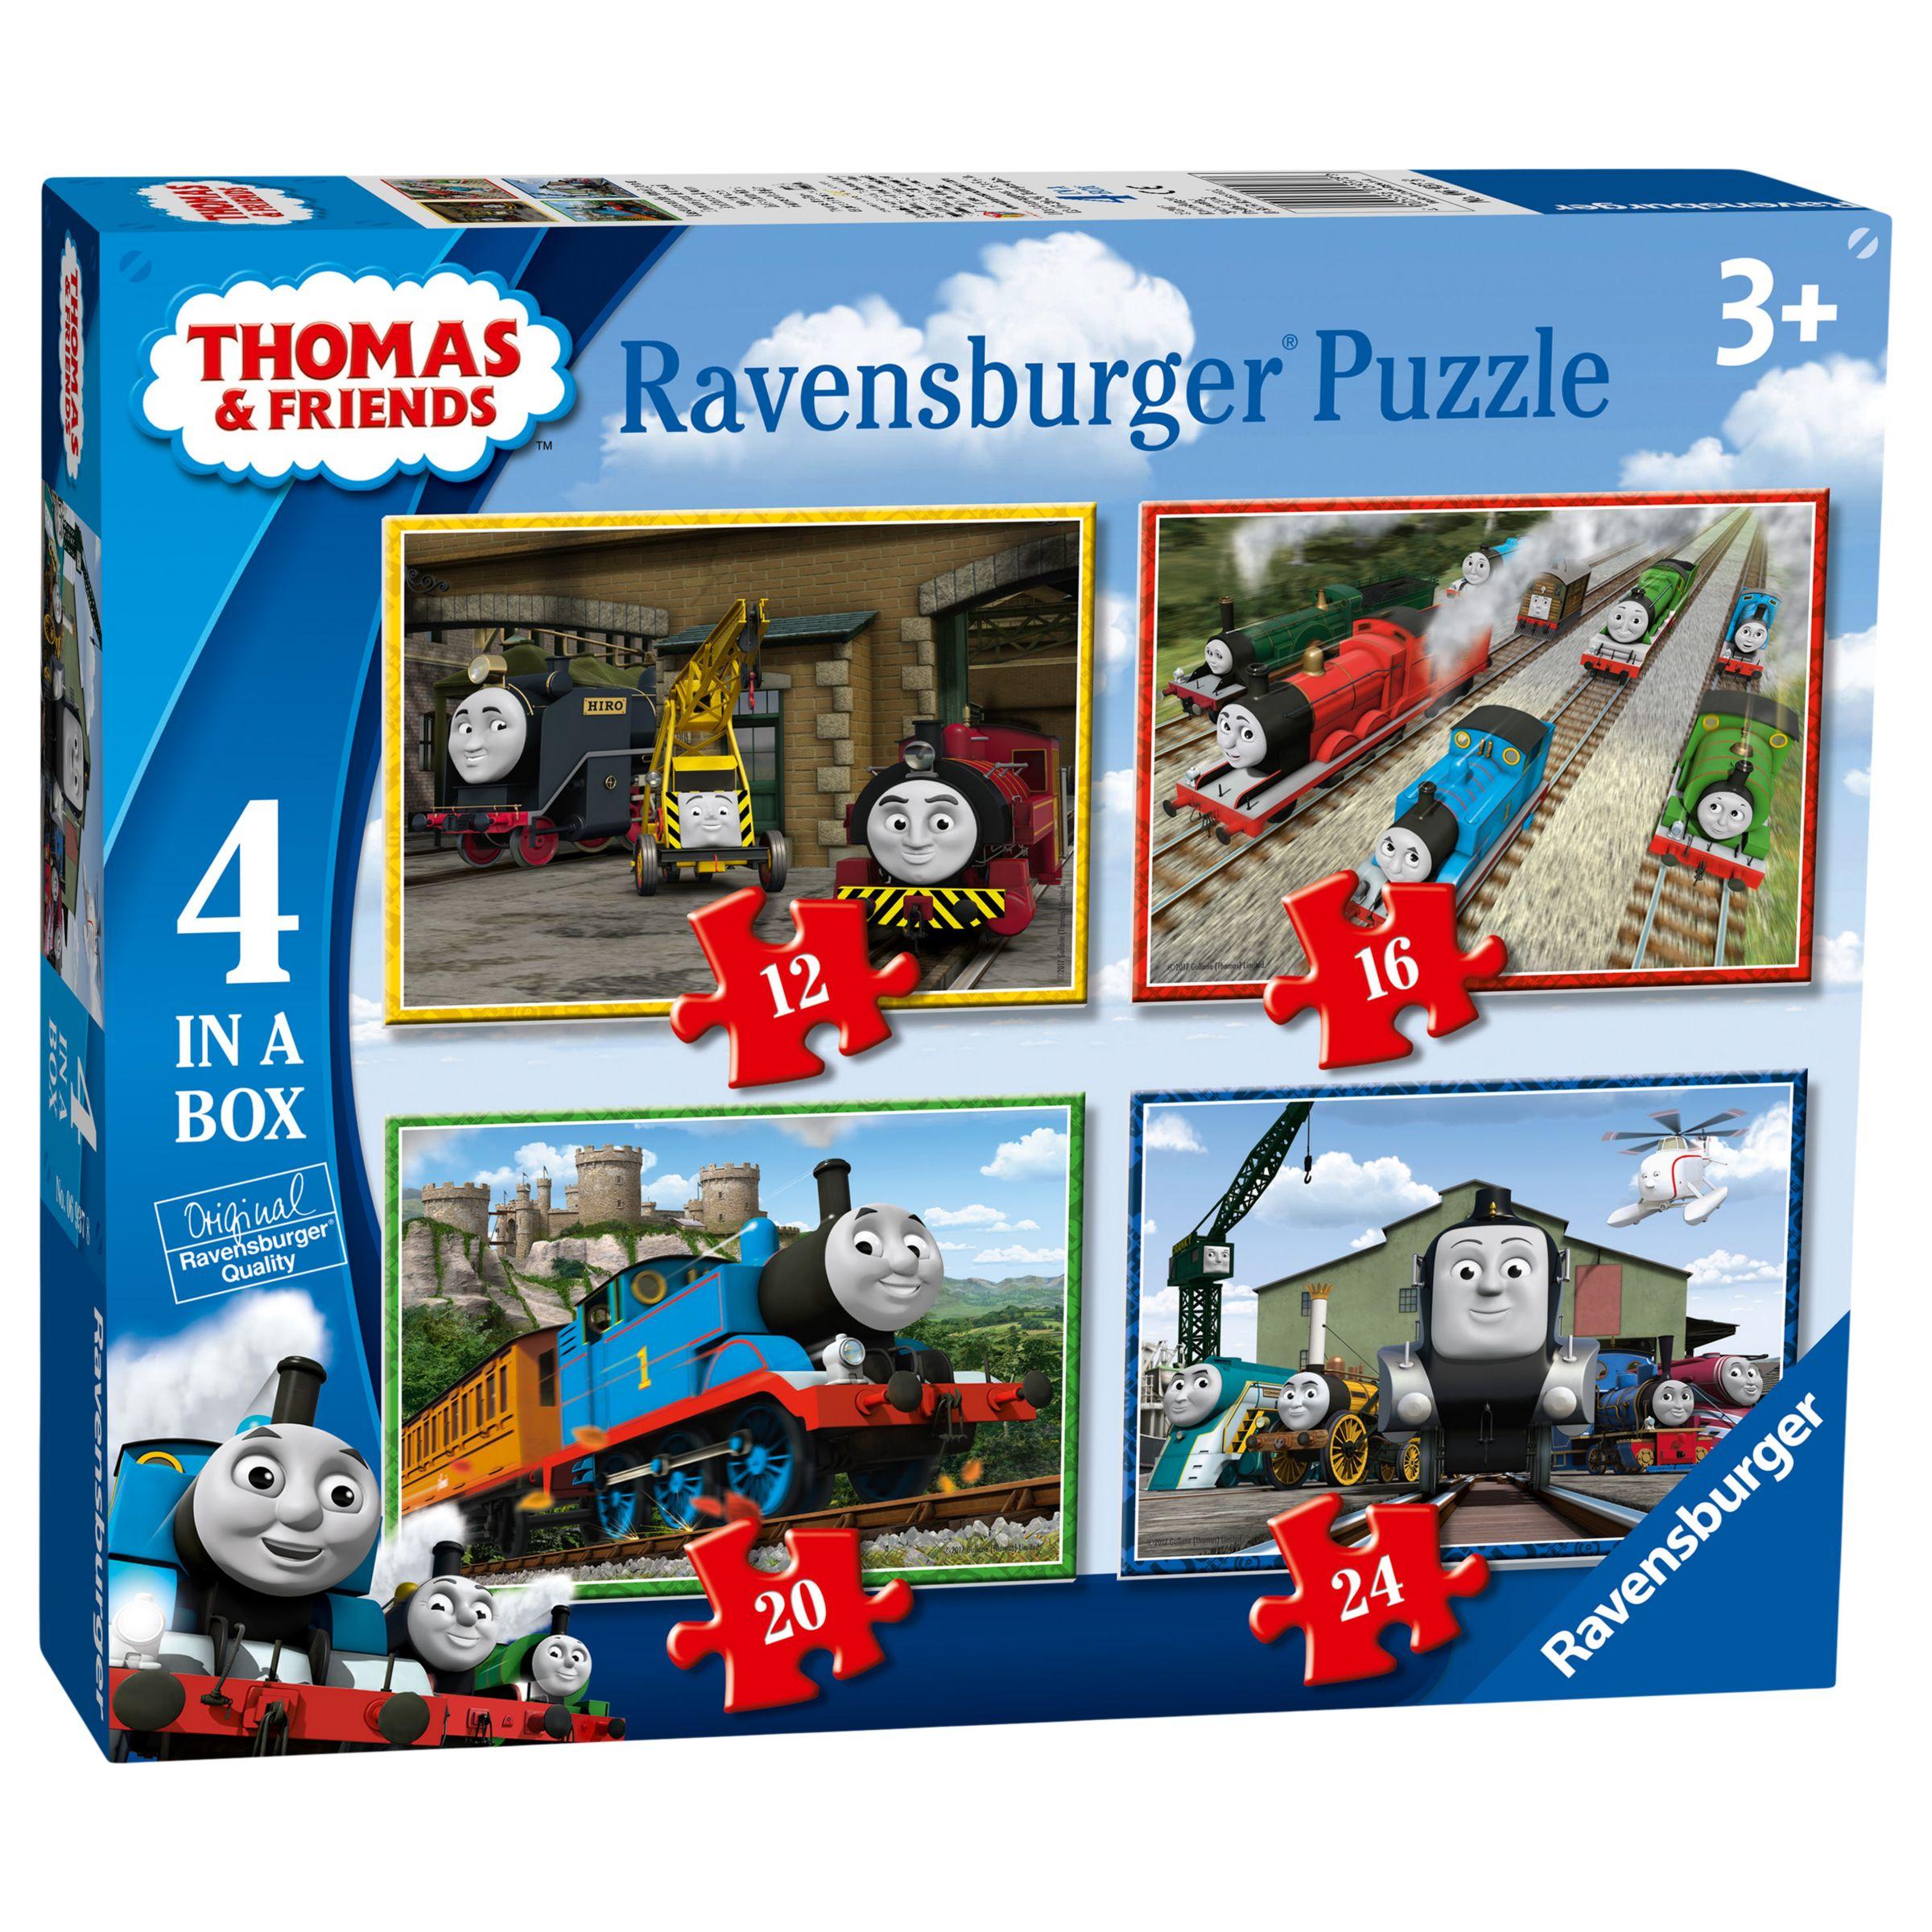 Ravensburger Ravensburger Thomas & Friends Jigsaw Puzzle, Pack of 4